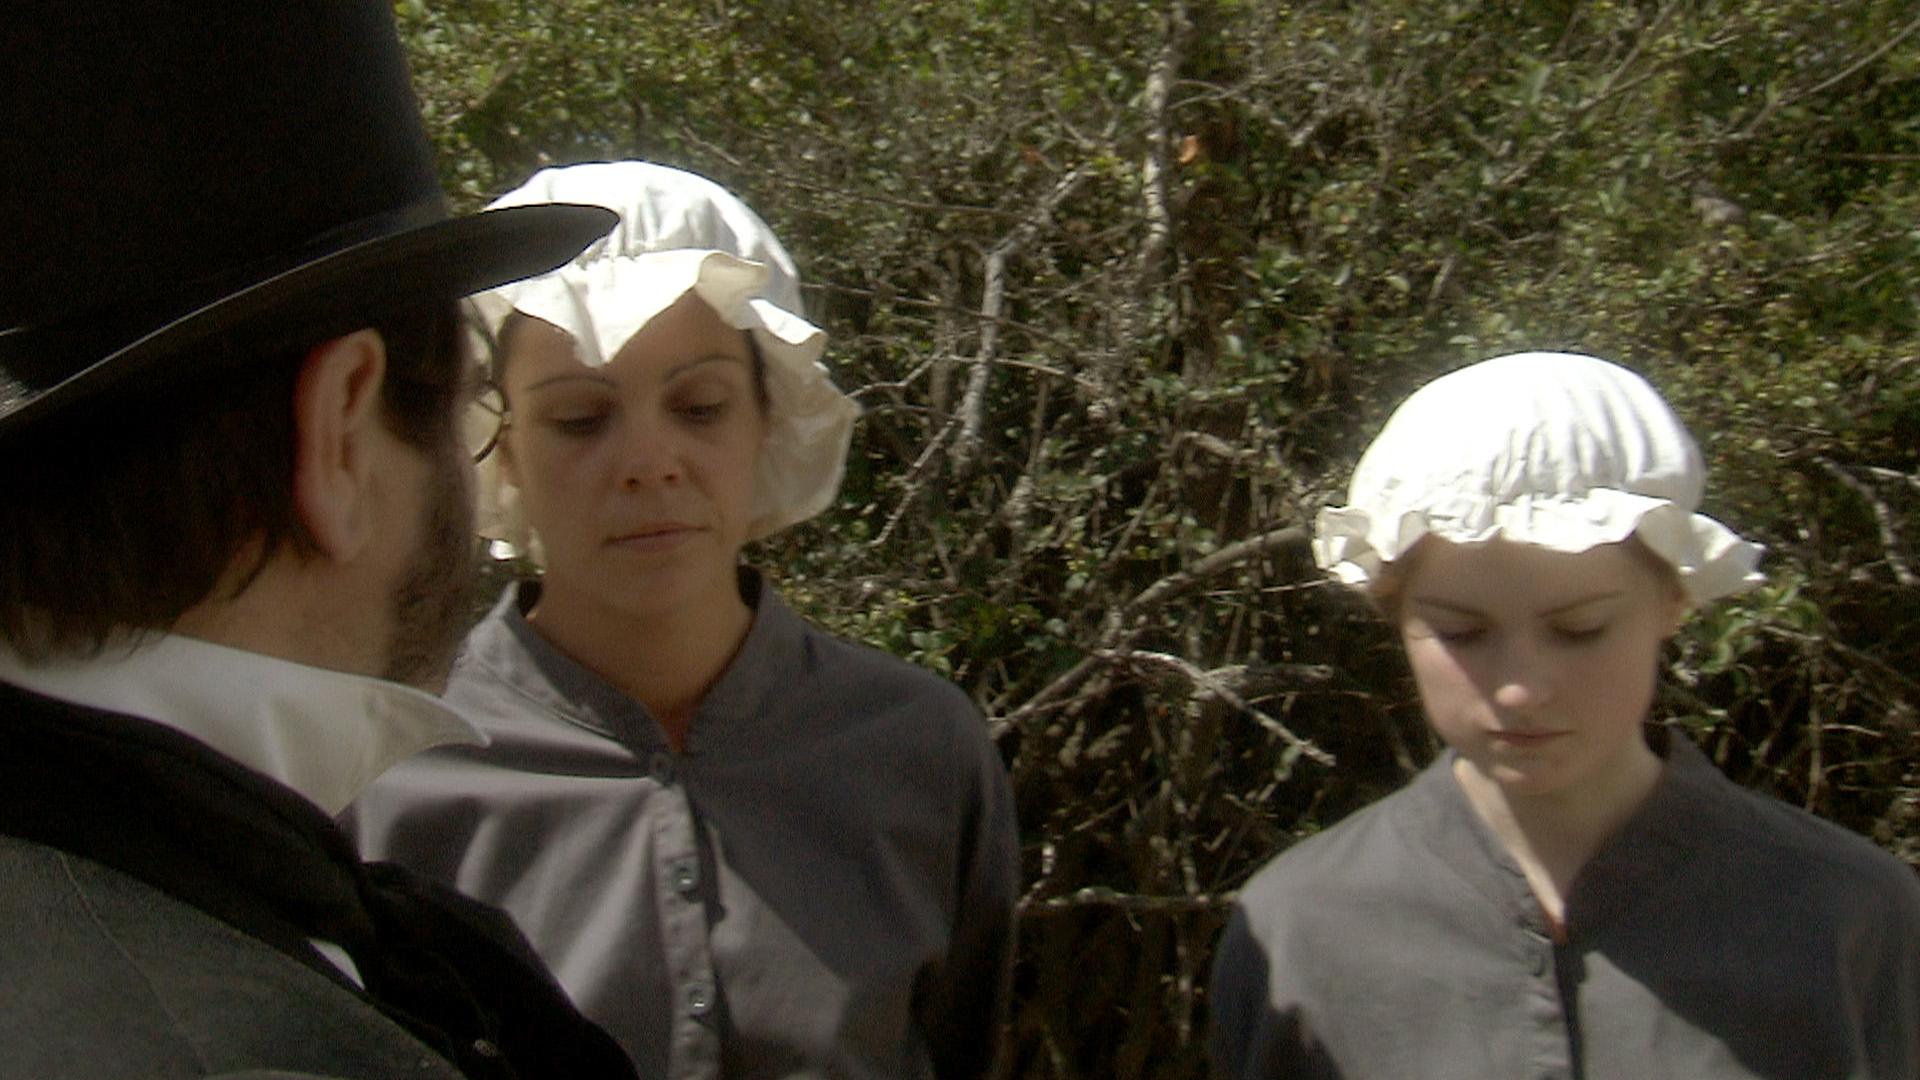 Network-Ireland-Television-Convict-Women-6-NITV.jpg